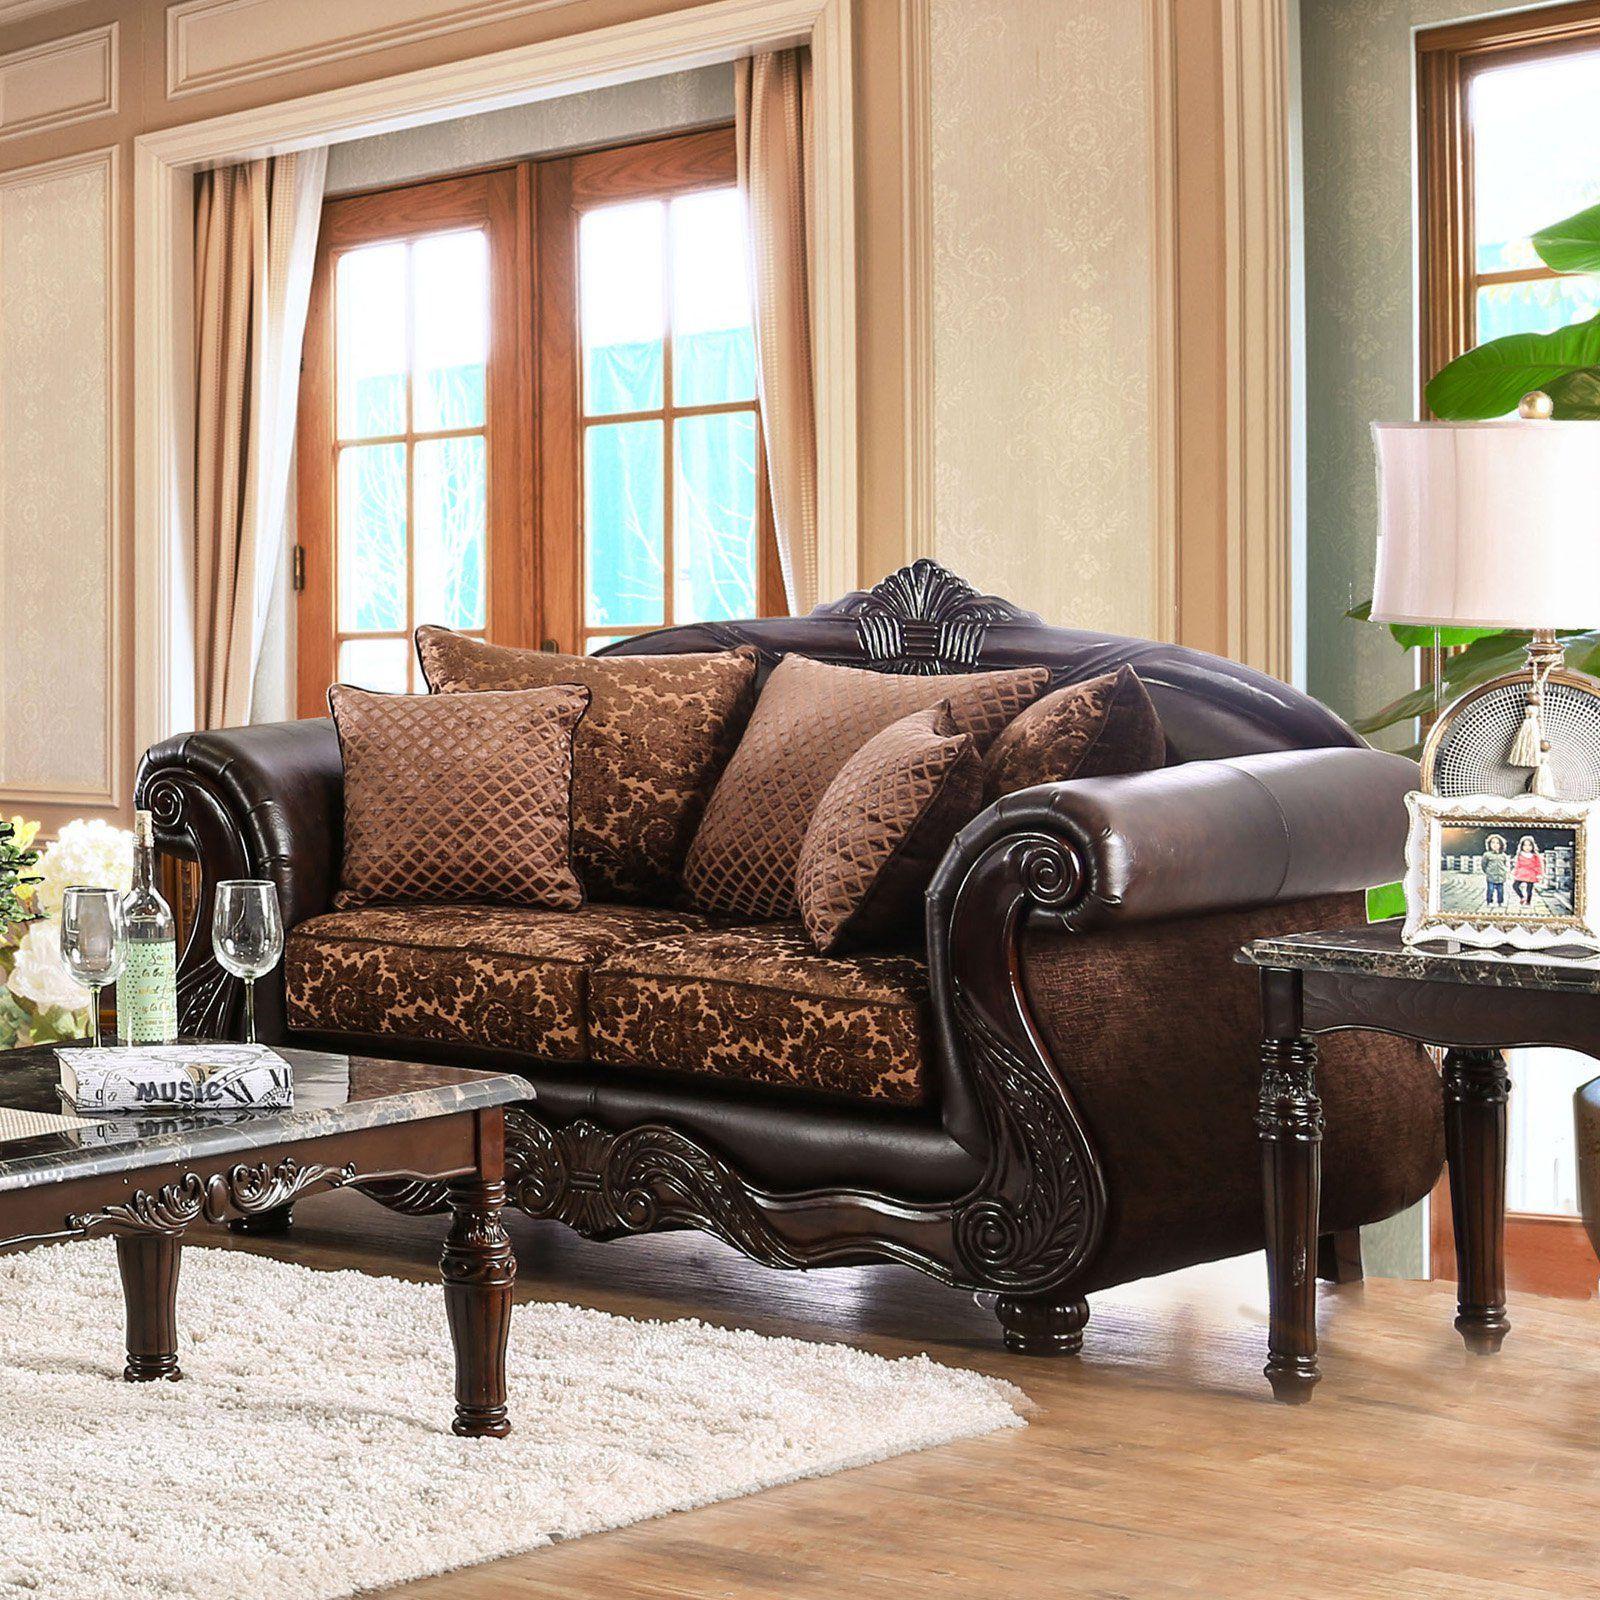 Furniture Of America Maldino Traditional Style Intricate Wood